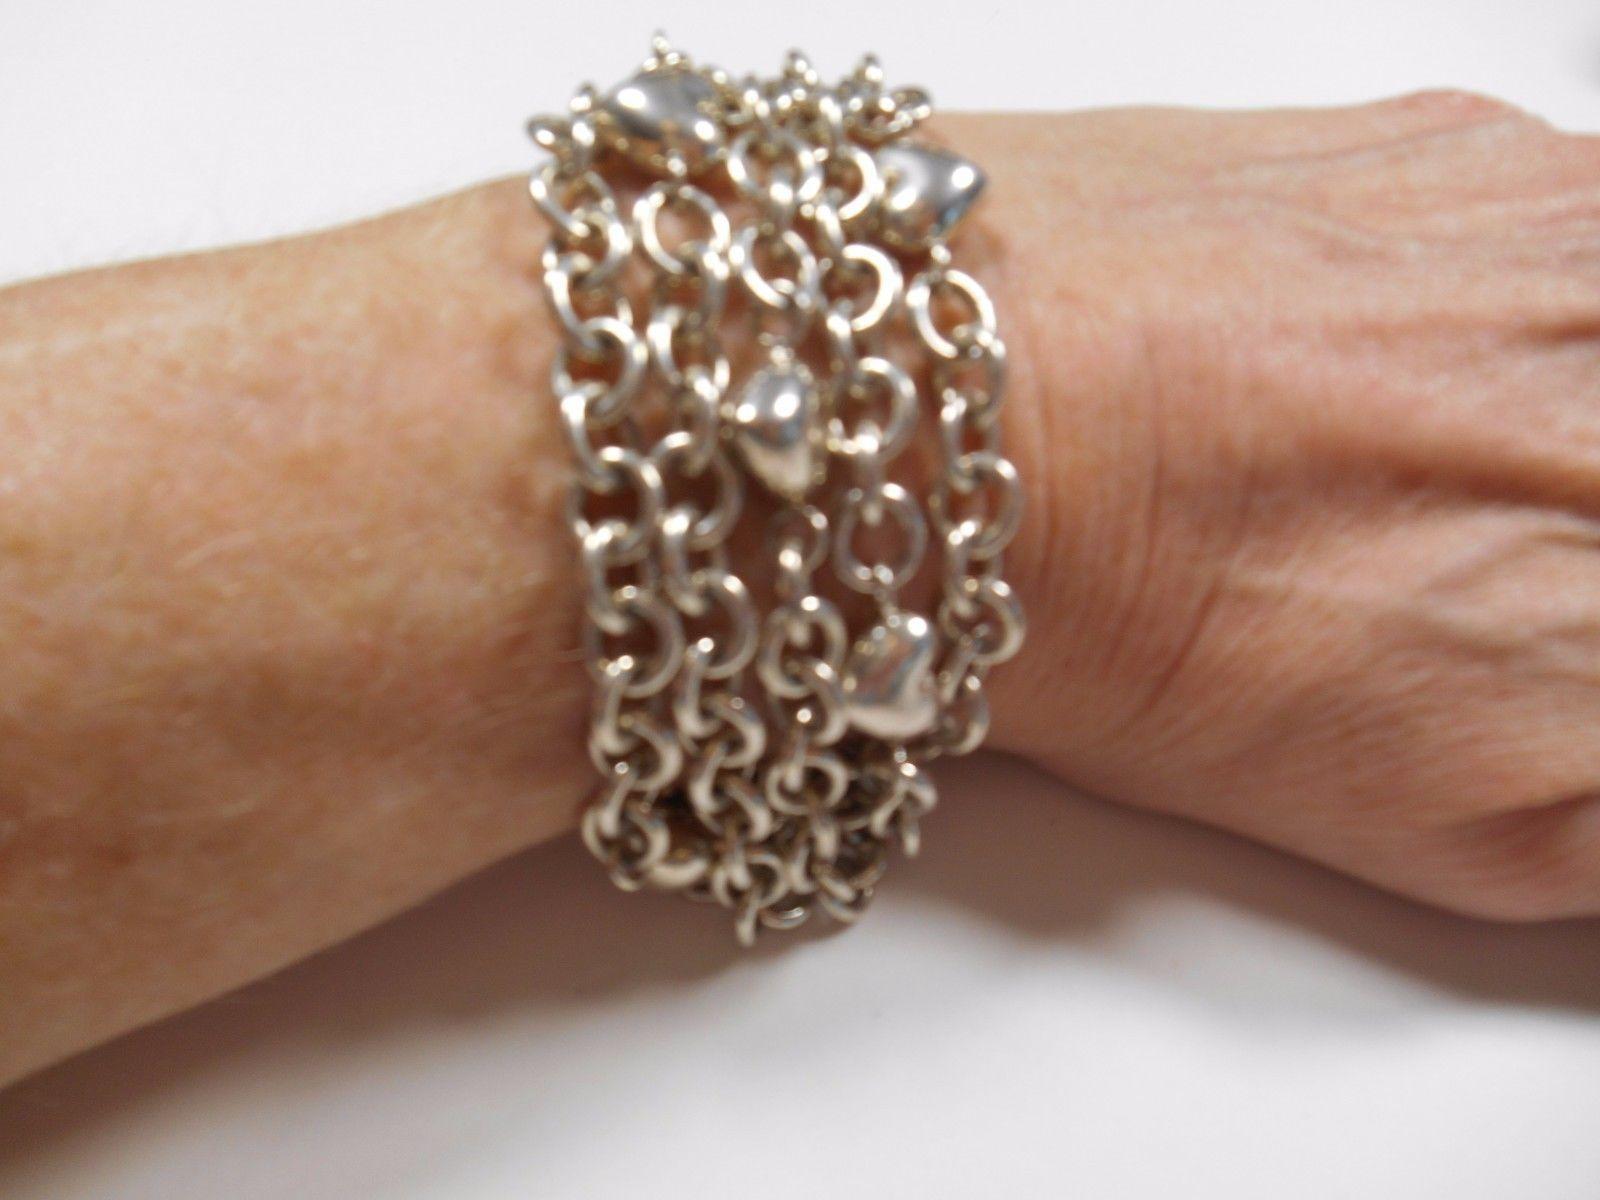 f07db788f TIFFANY & Co Puffed Heart Multi 5 Strand Chain Toggle Clasp Bracelet RARE